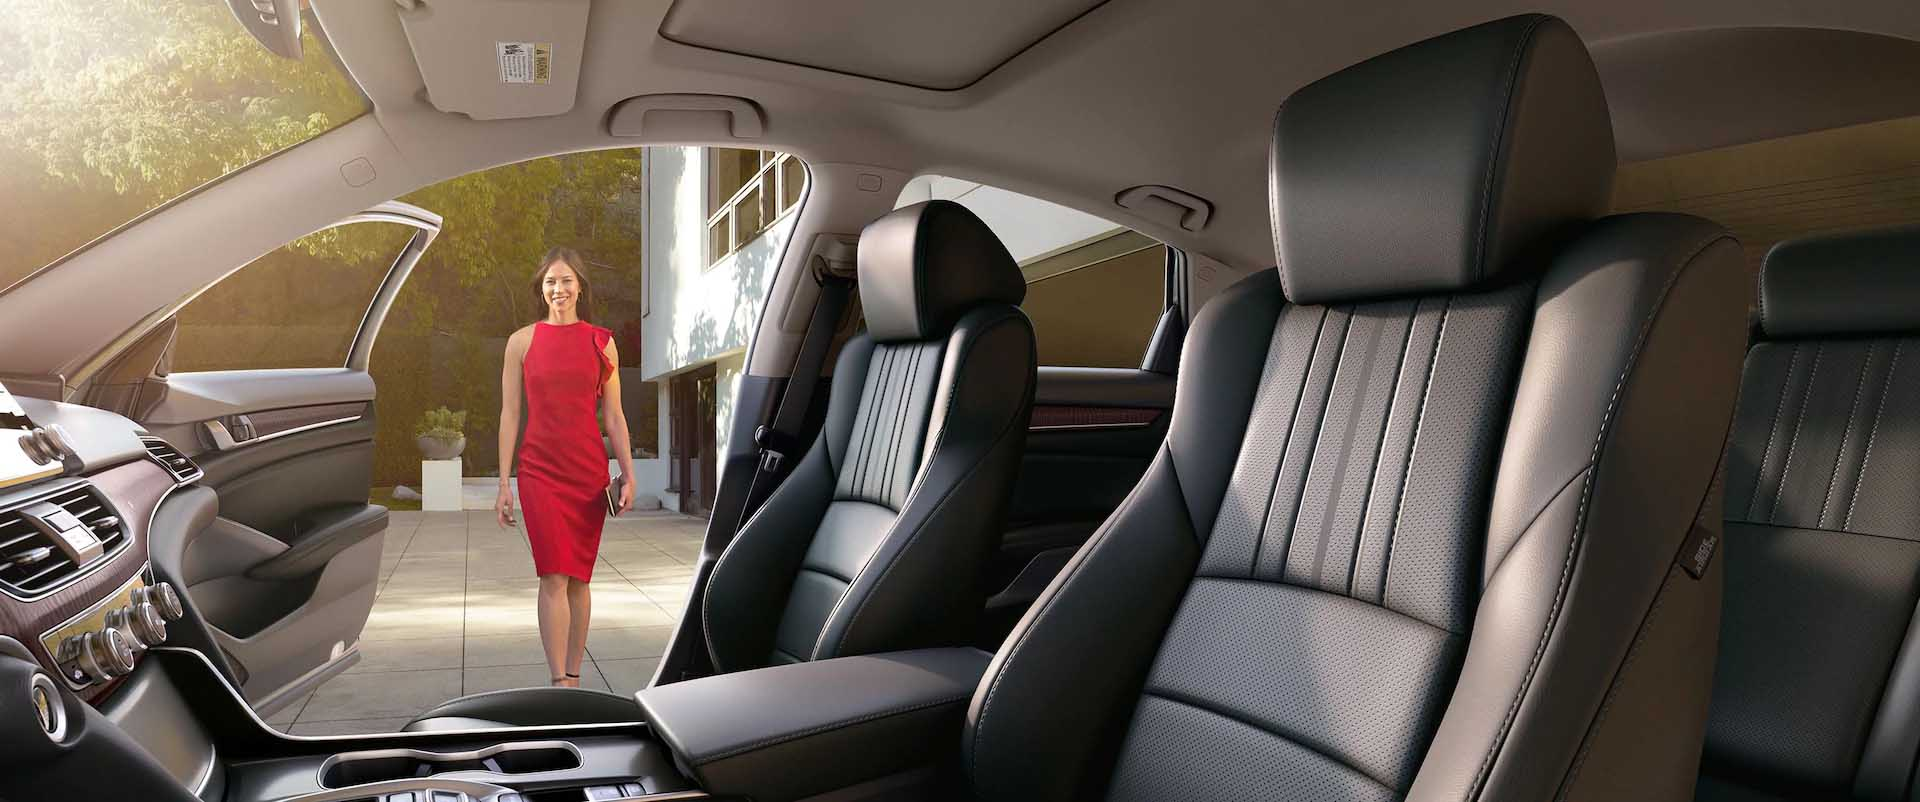 Honda Accord with Sunroof